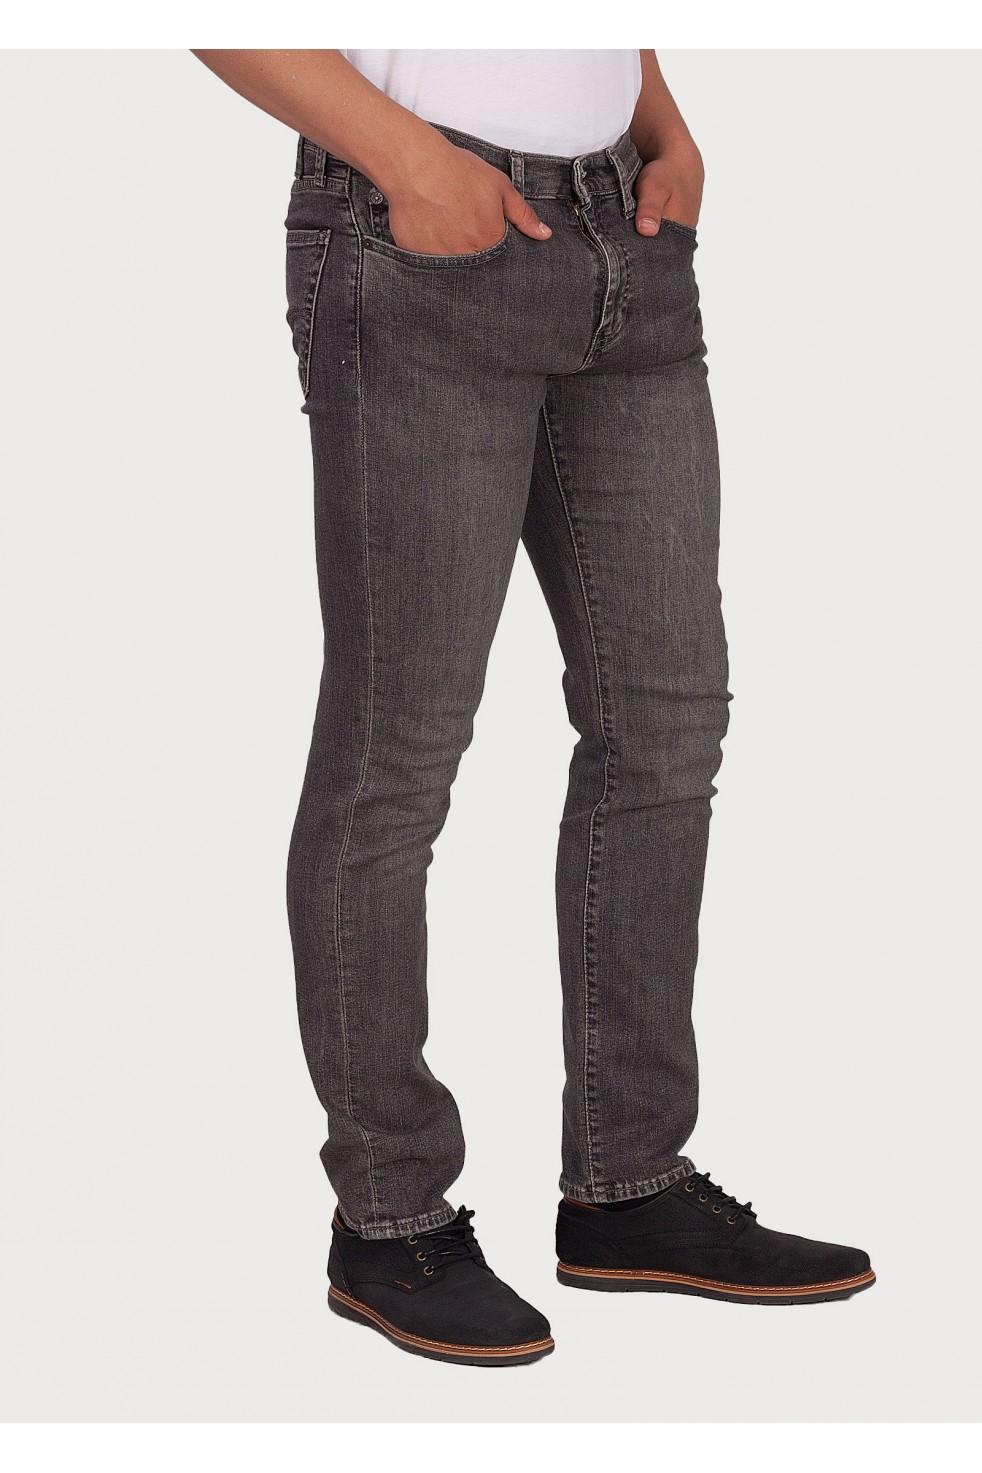 Levis Erkek Jean Pantolon 511 Slim Fıt 04511-2953